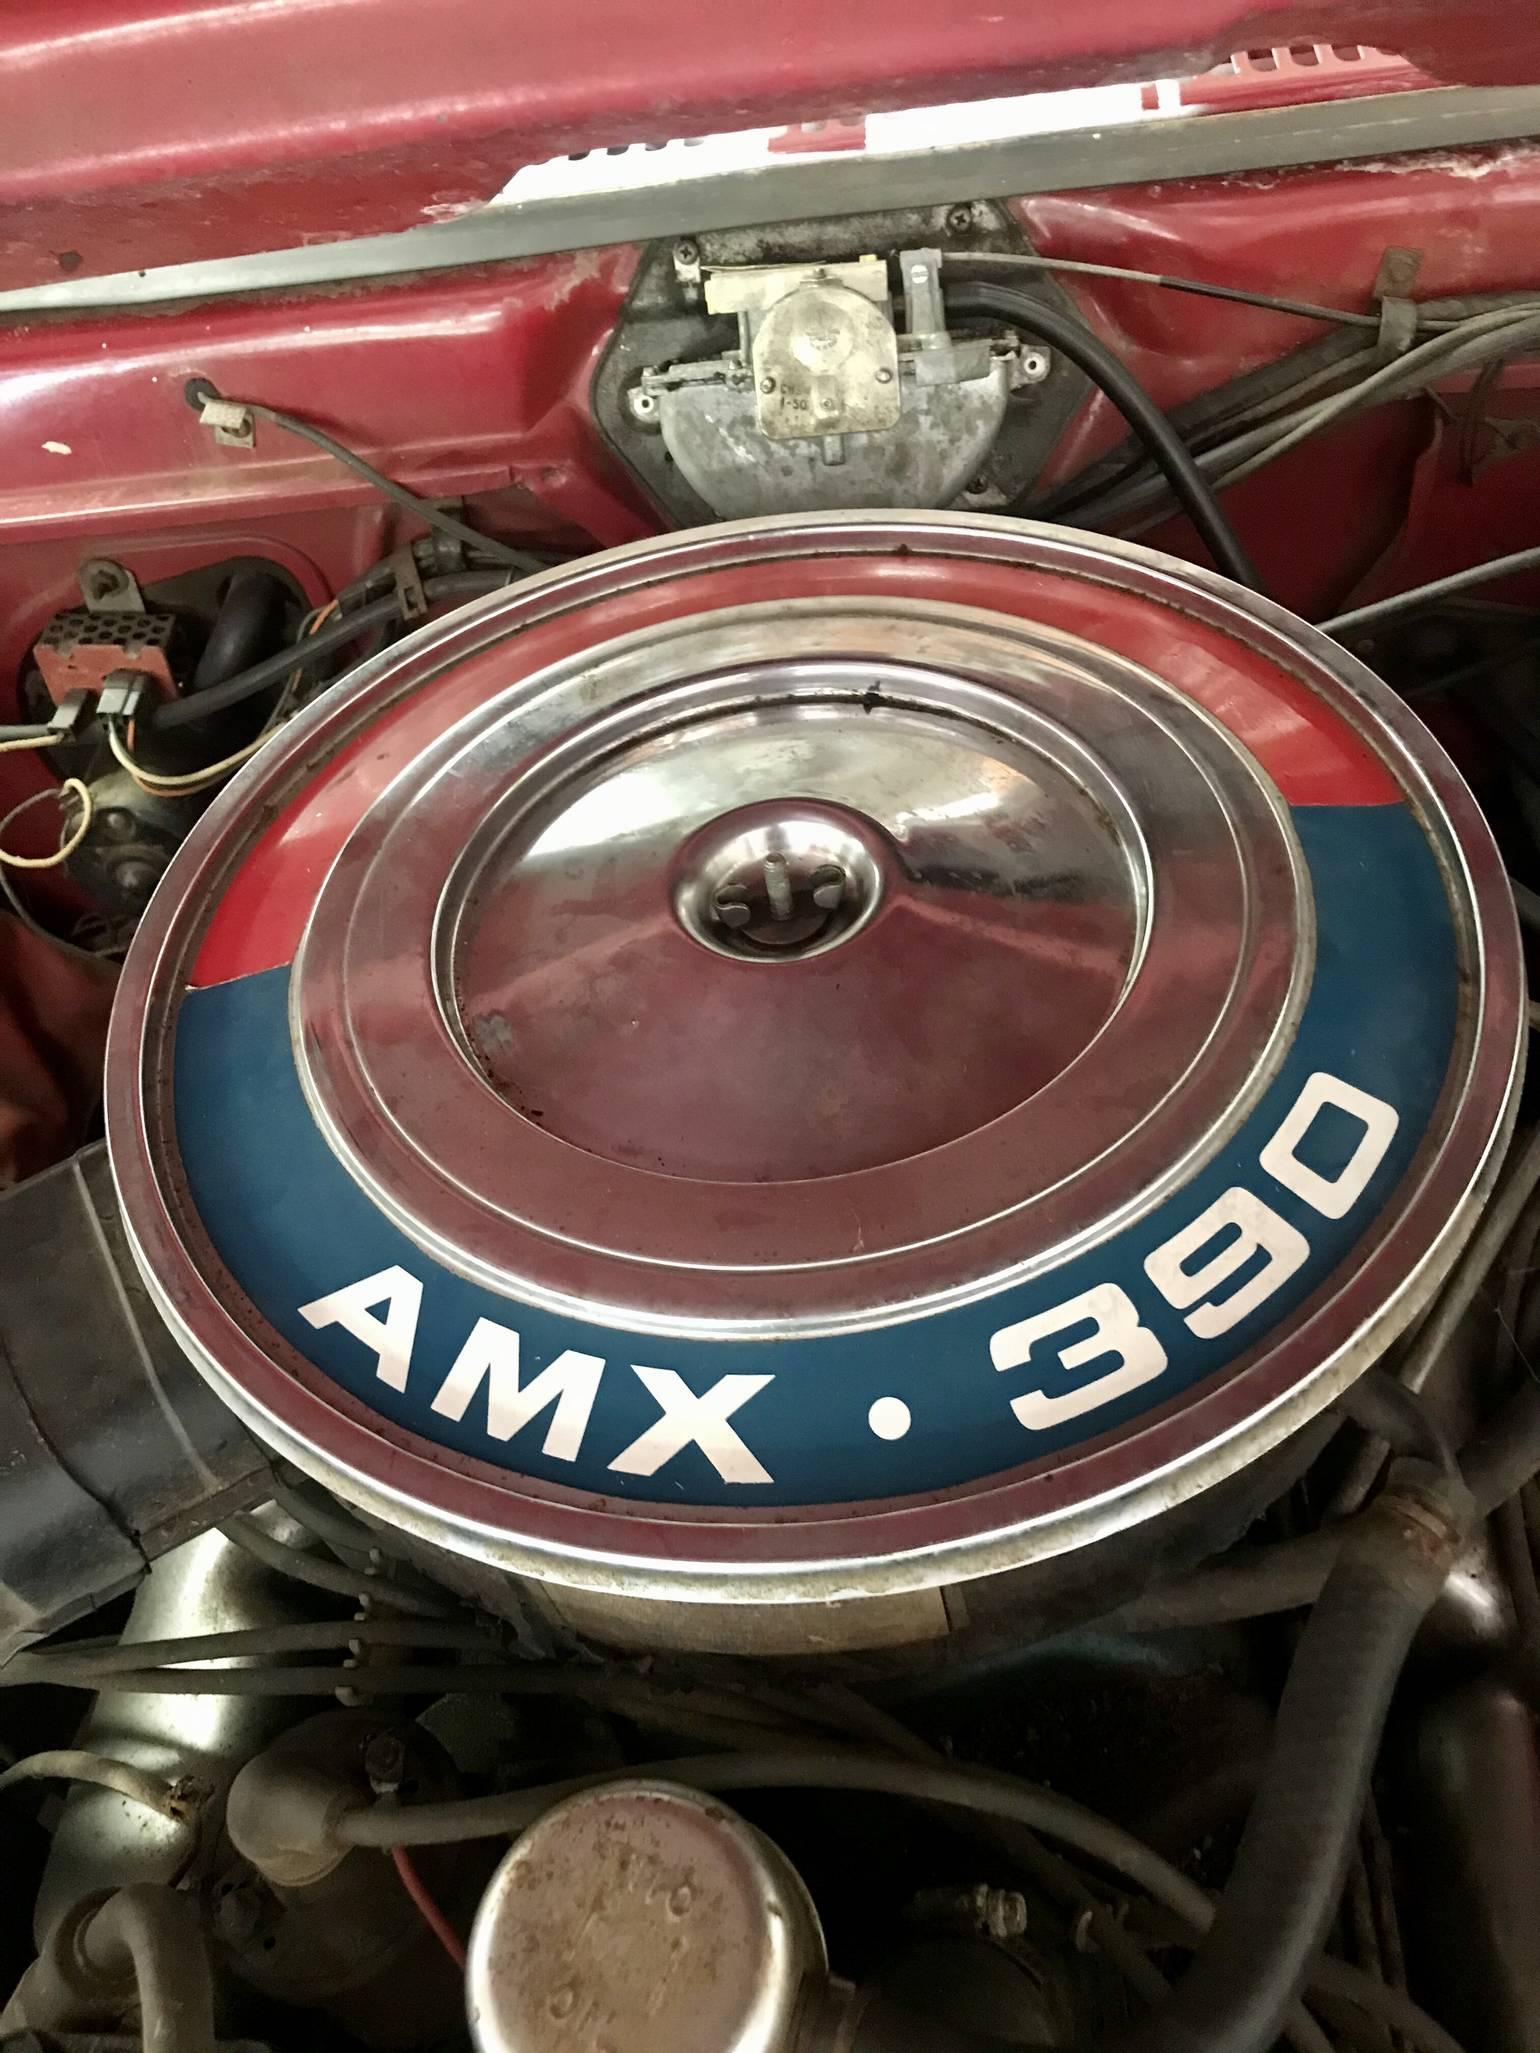 69 AMCAMX - 20